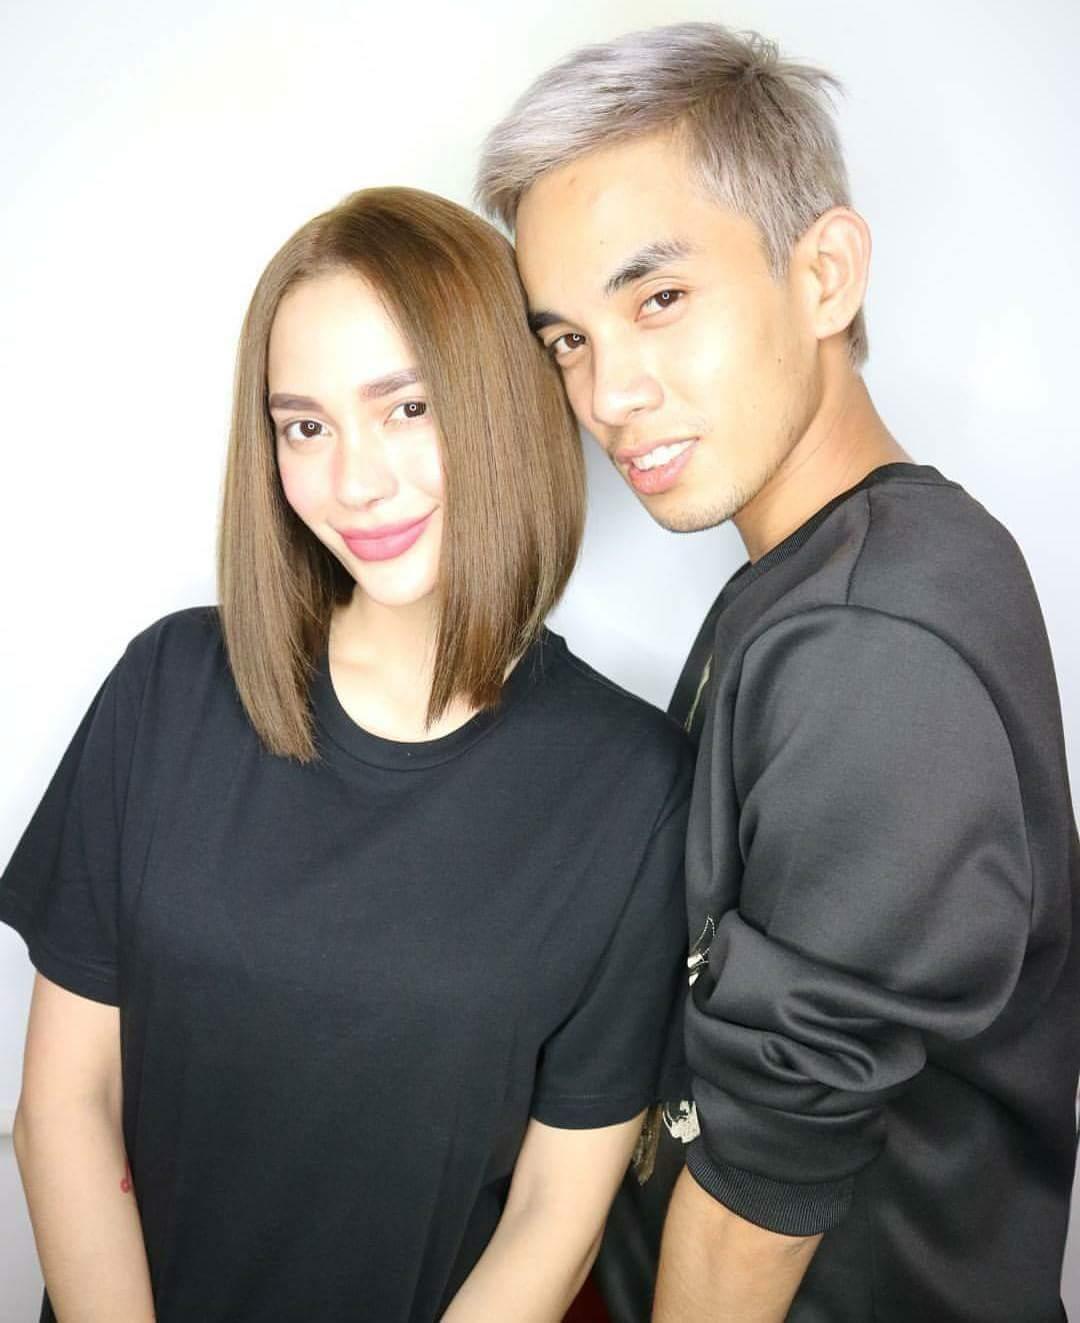 Photos Show Arci Muoz Having A Brand New Short Hairstyle Mykiru